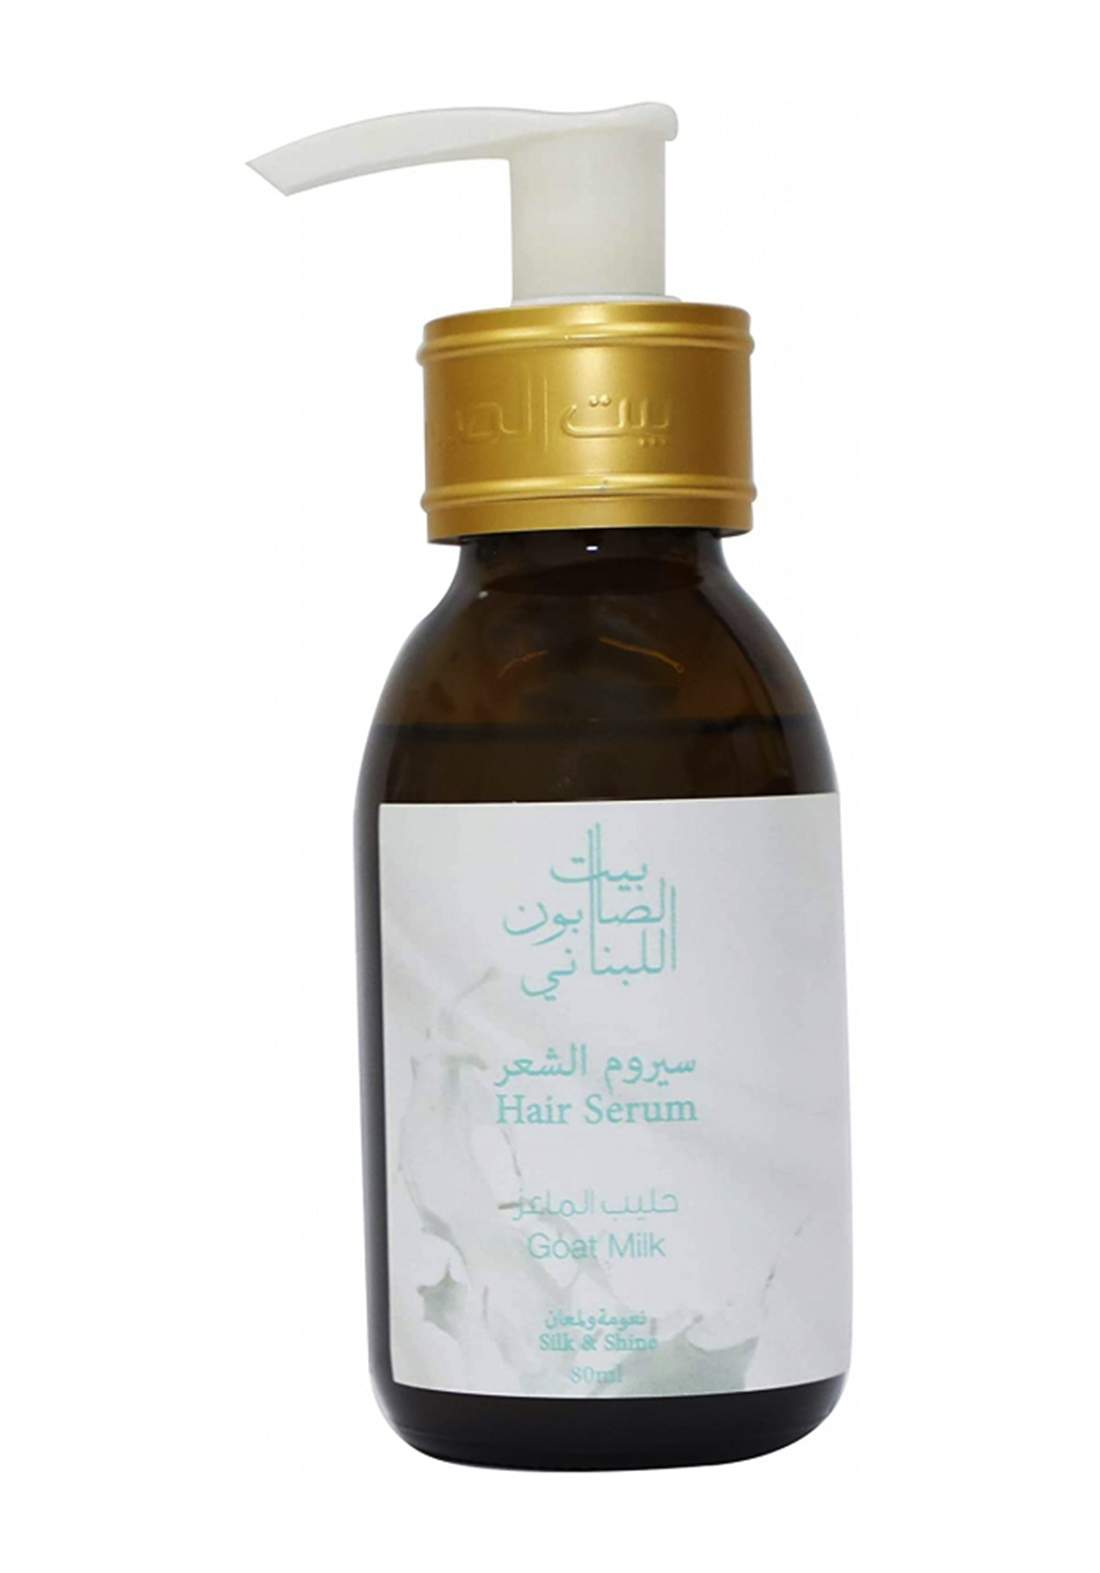 Bayt Alsaboun Alloubnani-317486 hair serum goat milk 80ml سيروم